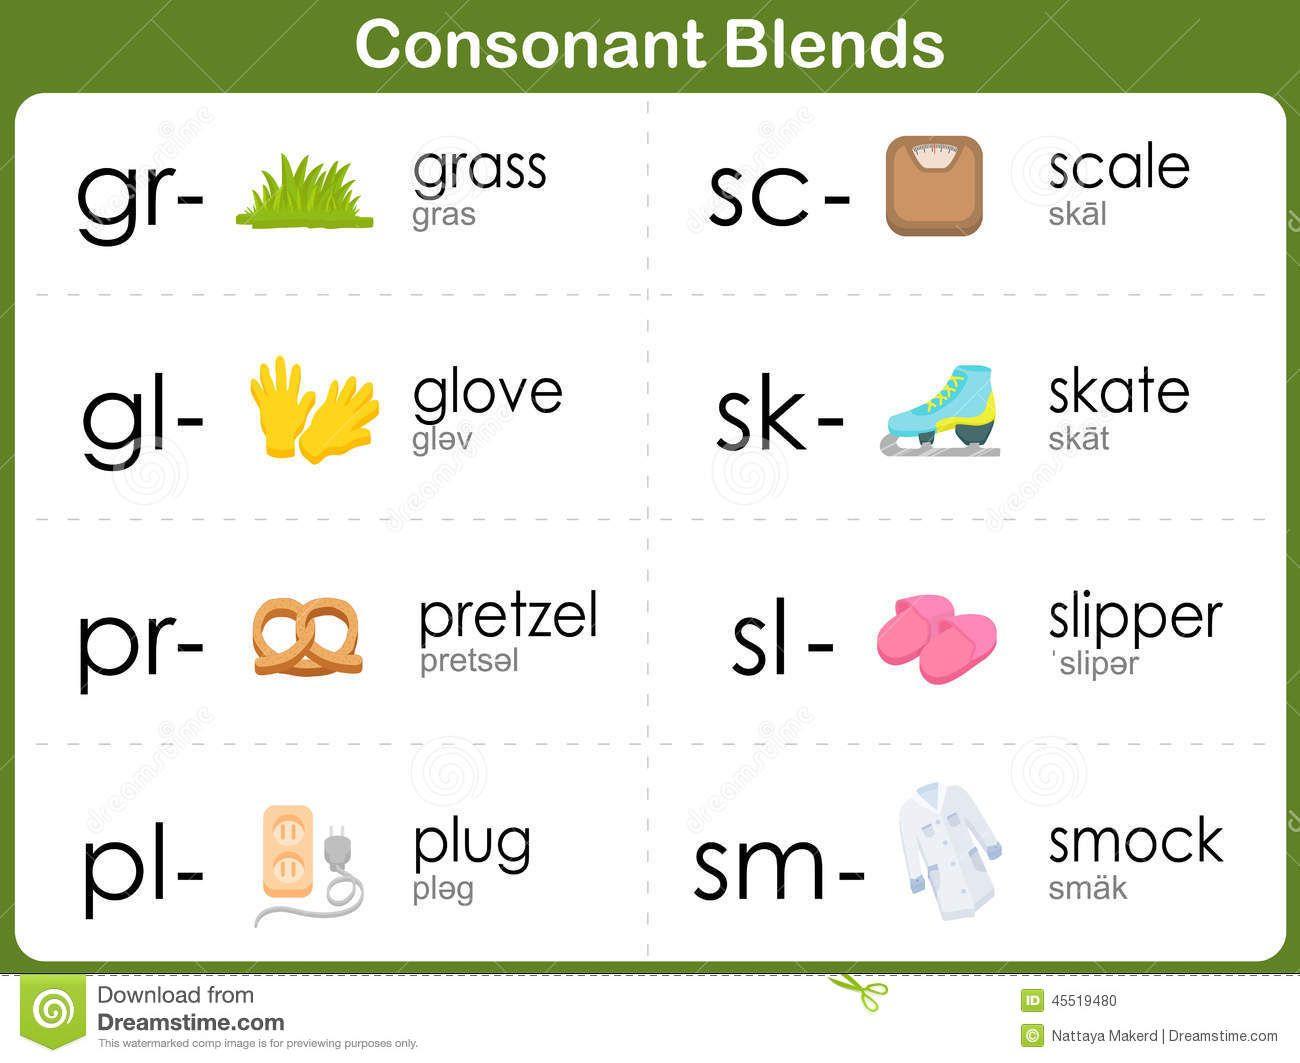 Worksheets Consonant Blend Worksheets consonant blends worksheet for kids stock vector image 45519480 45519480